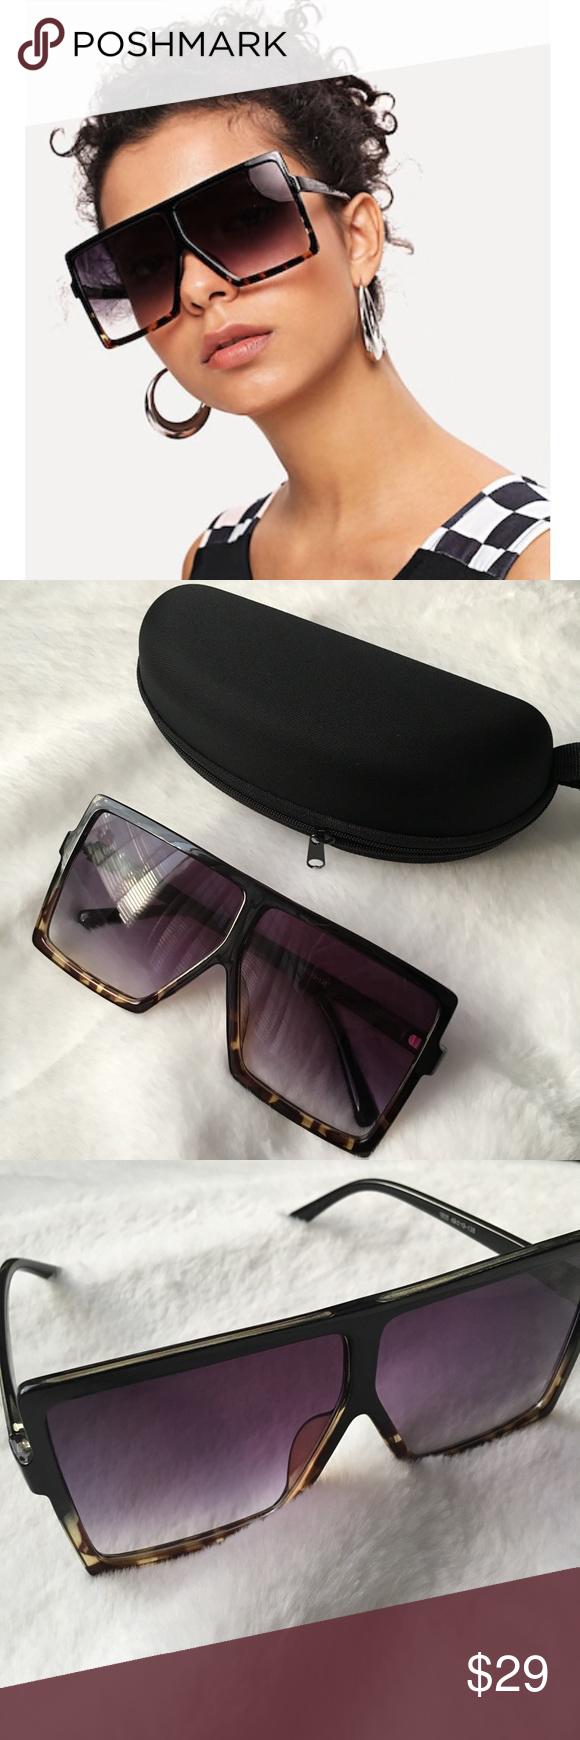 5cd76a0086bc30 Flat Top Oversized Sunglasses NEW Flat top oversized sunglasses. Frame is  black fade to leopard